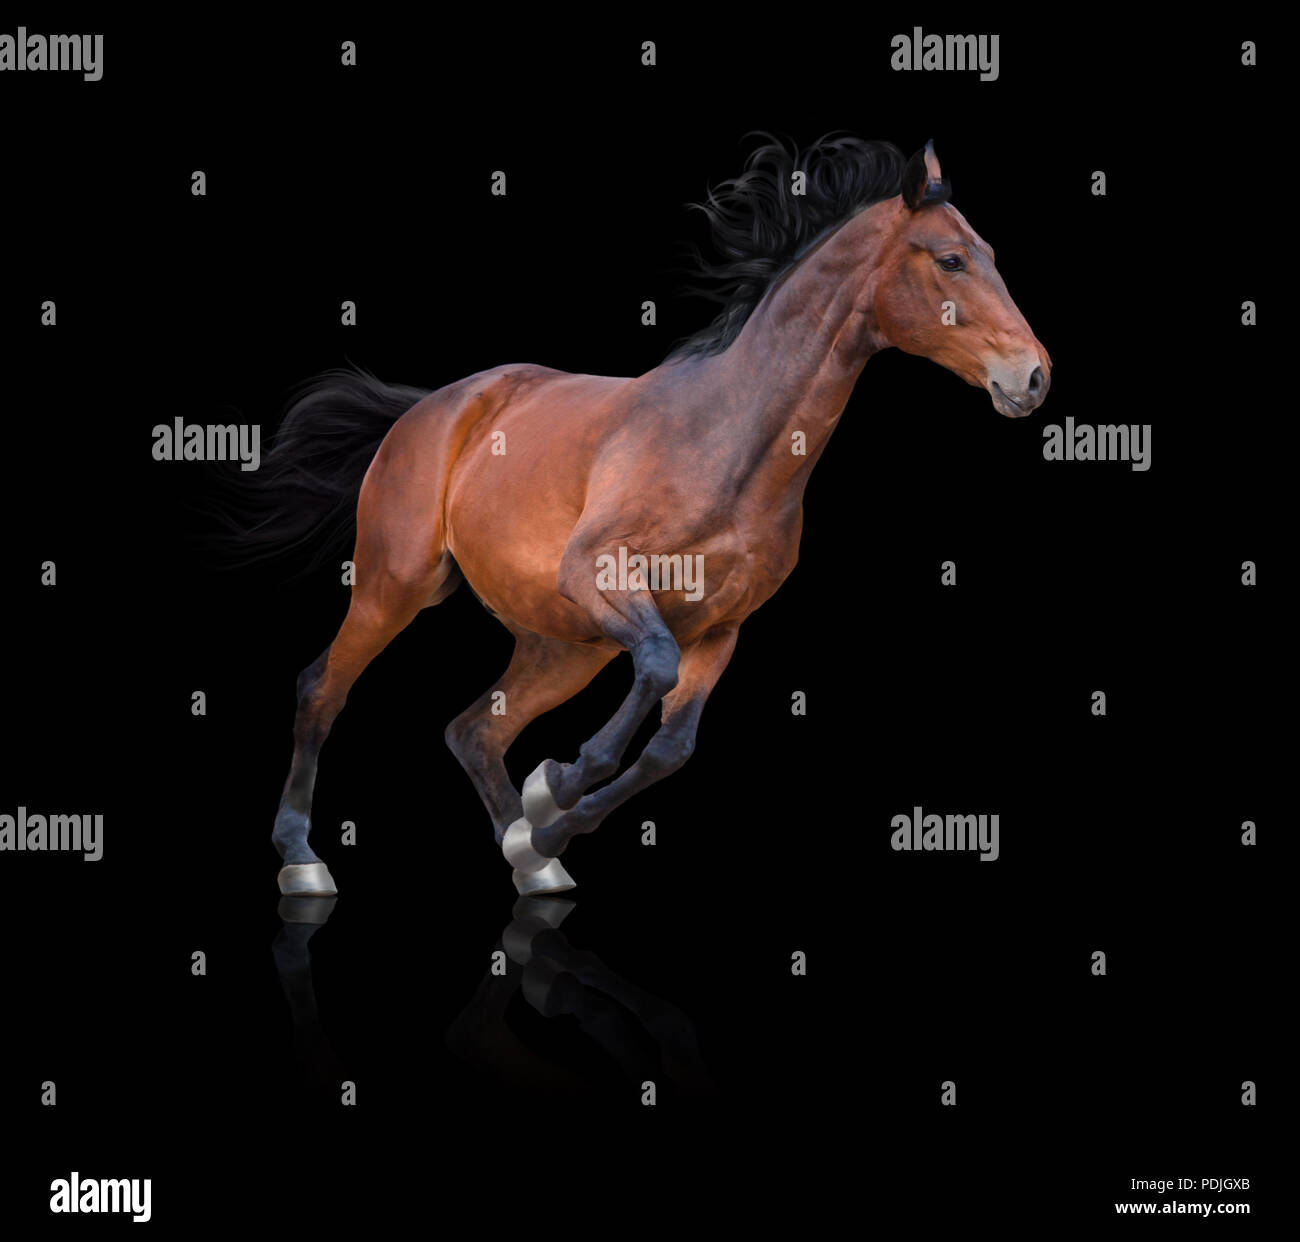 Bay horse runs on the black background - Stock Image